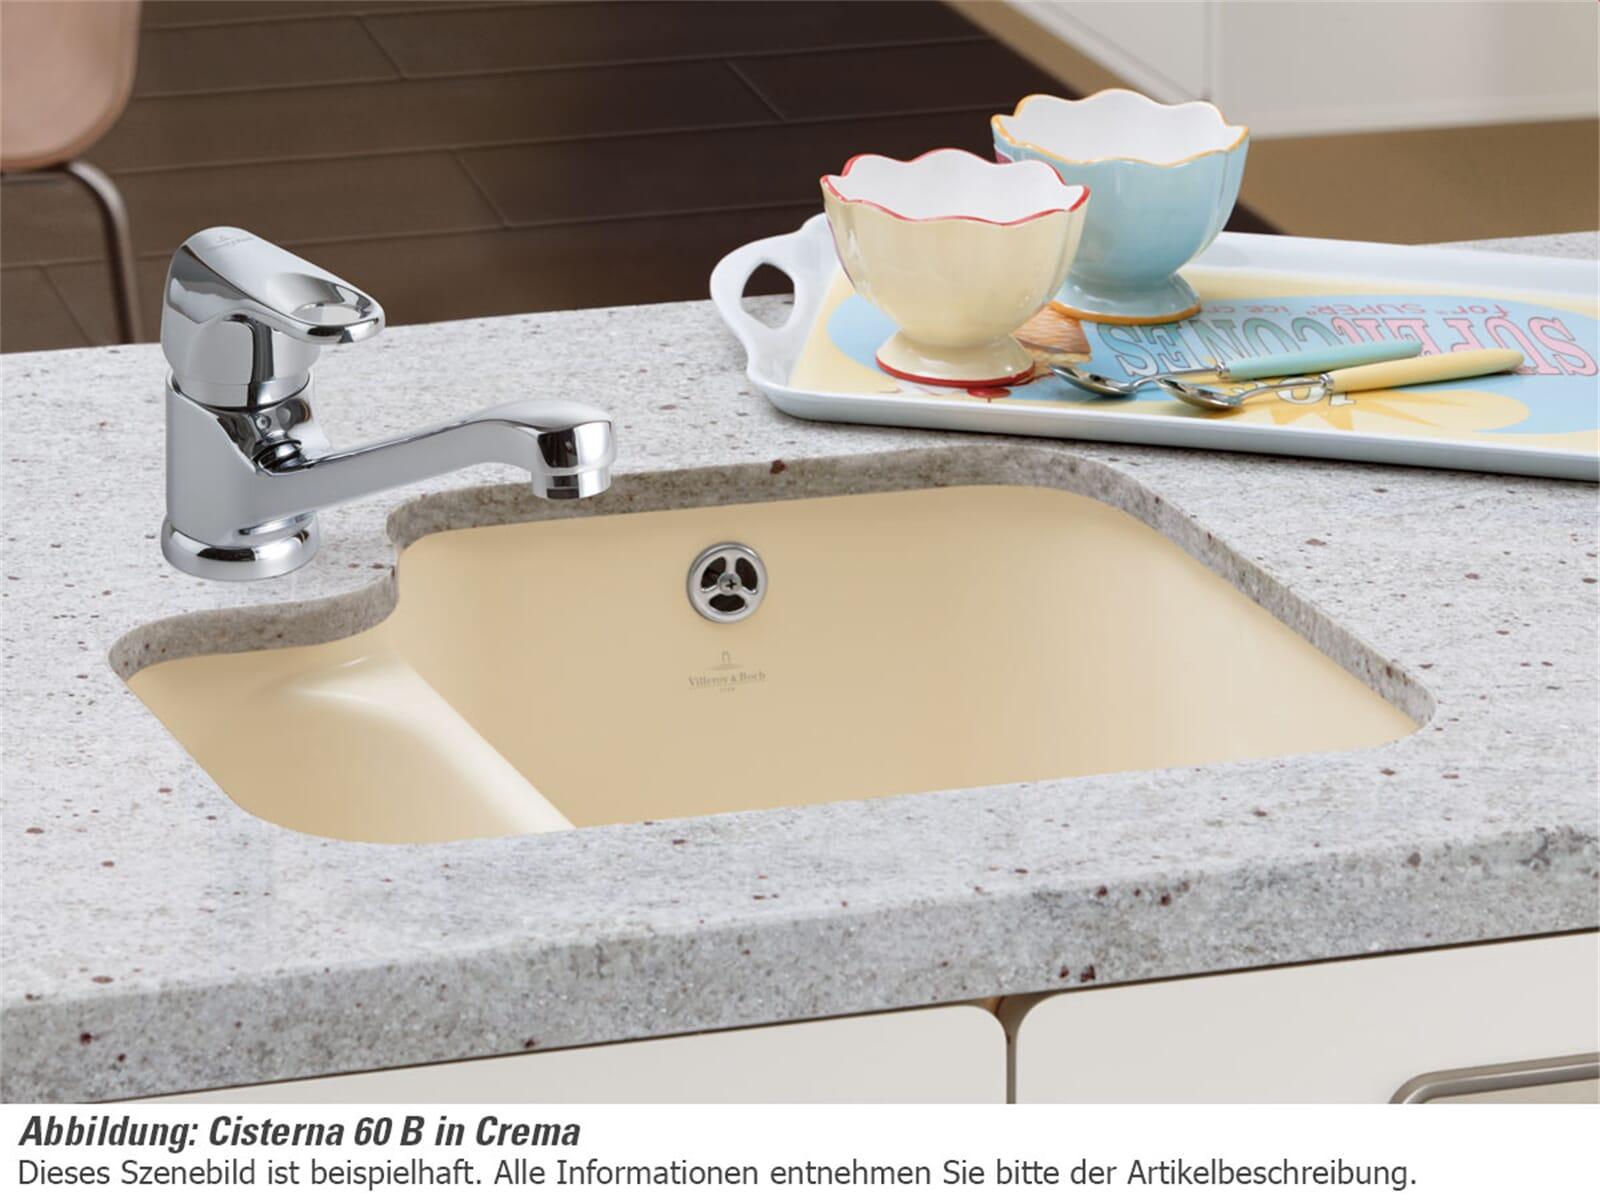 villeroy boch cisterna 60b chromit keramik sp le ebay. Black Bedroom Furniture Sets. Home Design Ideas